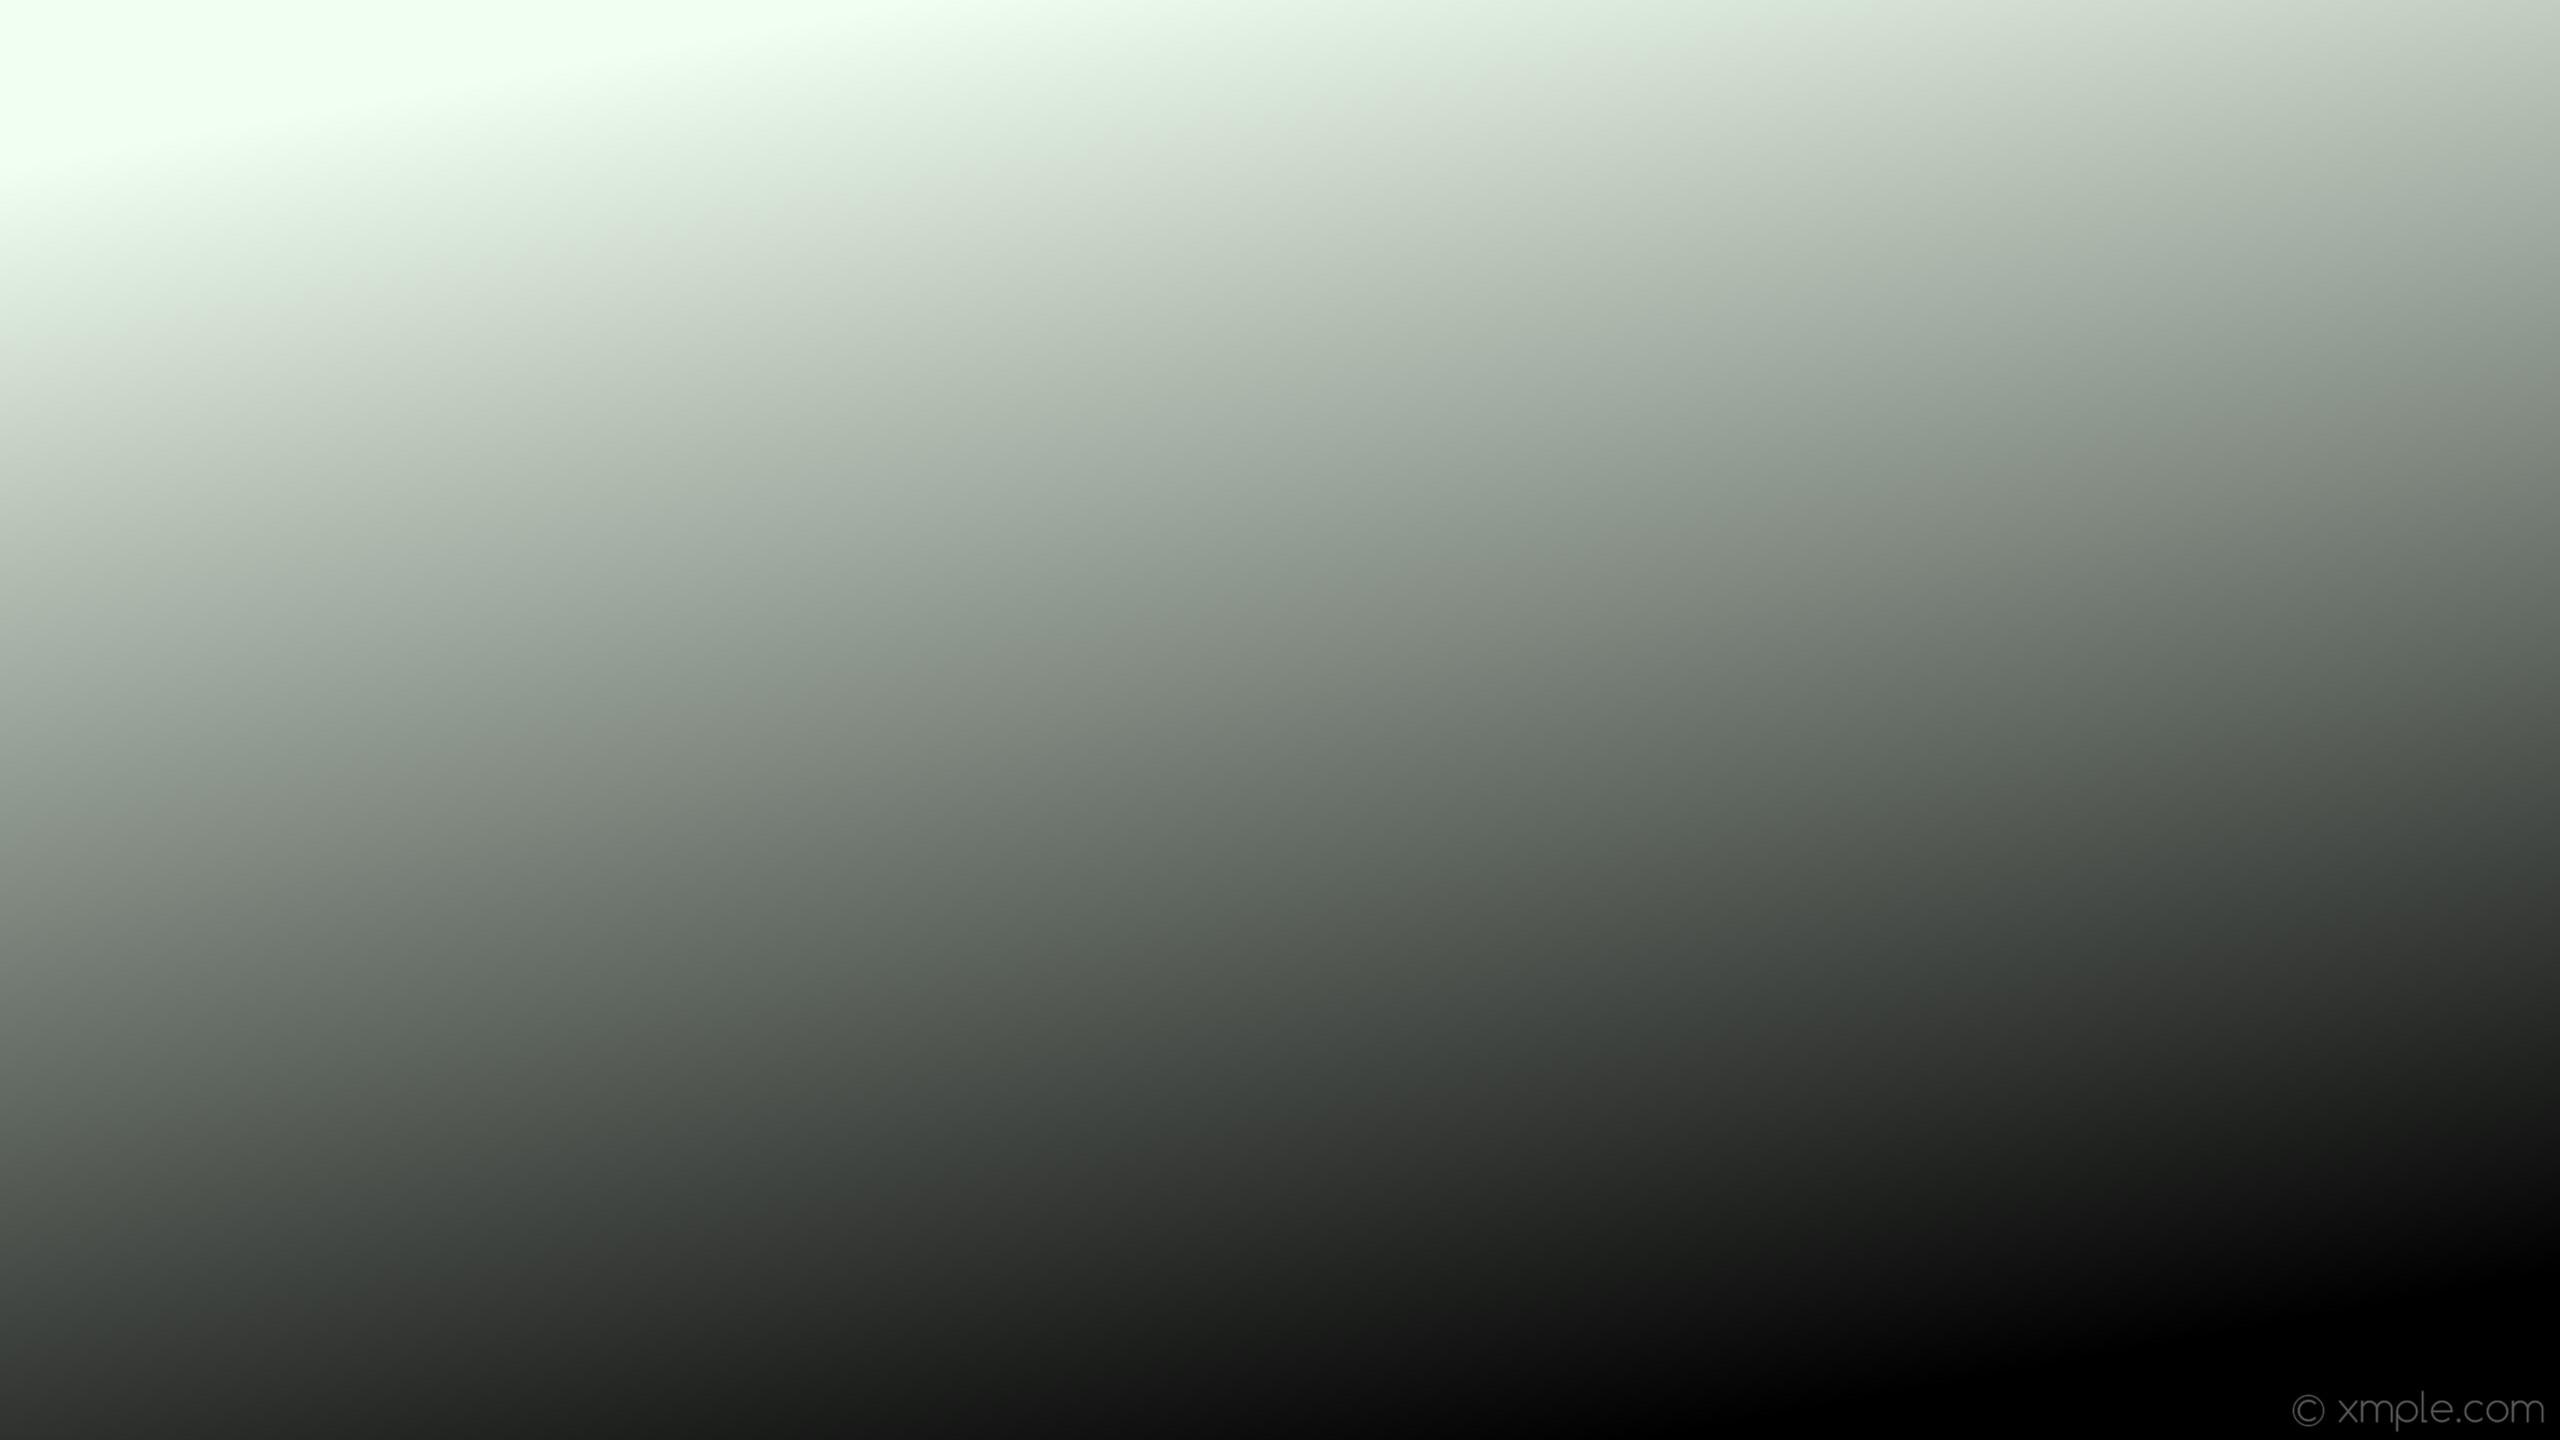 wallpaper black white gradient linear honeydew #000000 #f0fff0 300°